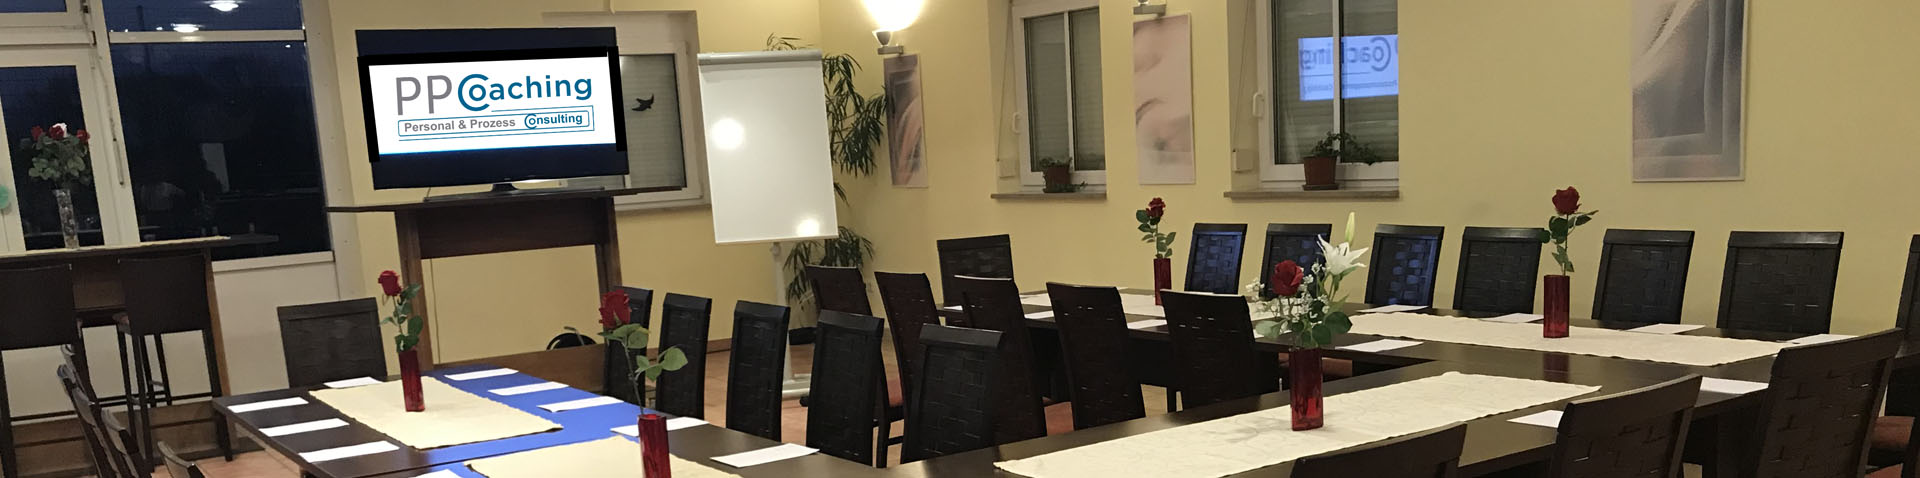 Workshops Seminarraum